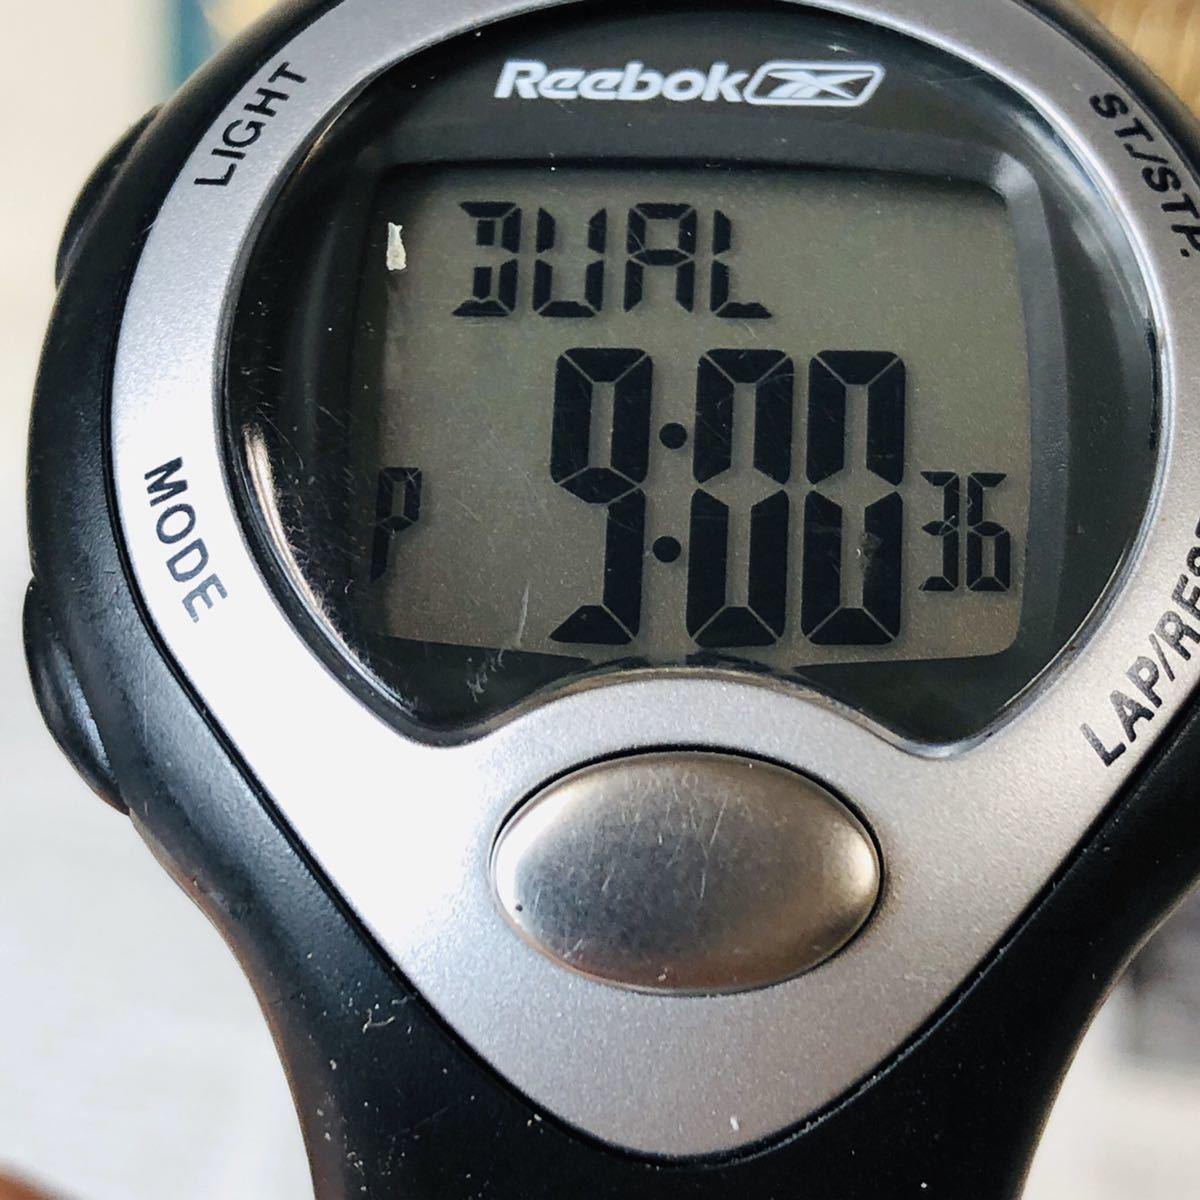 Reebok リーボック 腕時計 マットサテンシルバーカラー ブラック 心拍計 クロノ タイマー デジタル 稼動品 W730_画像9